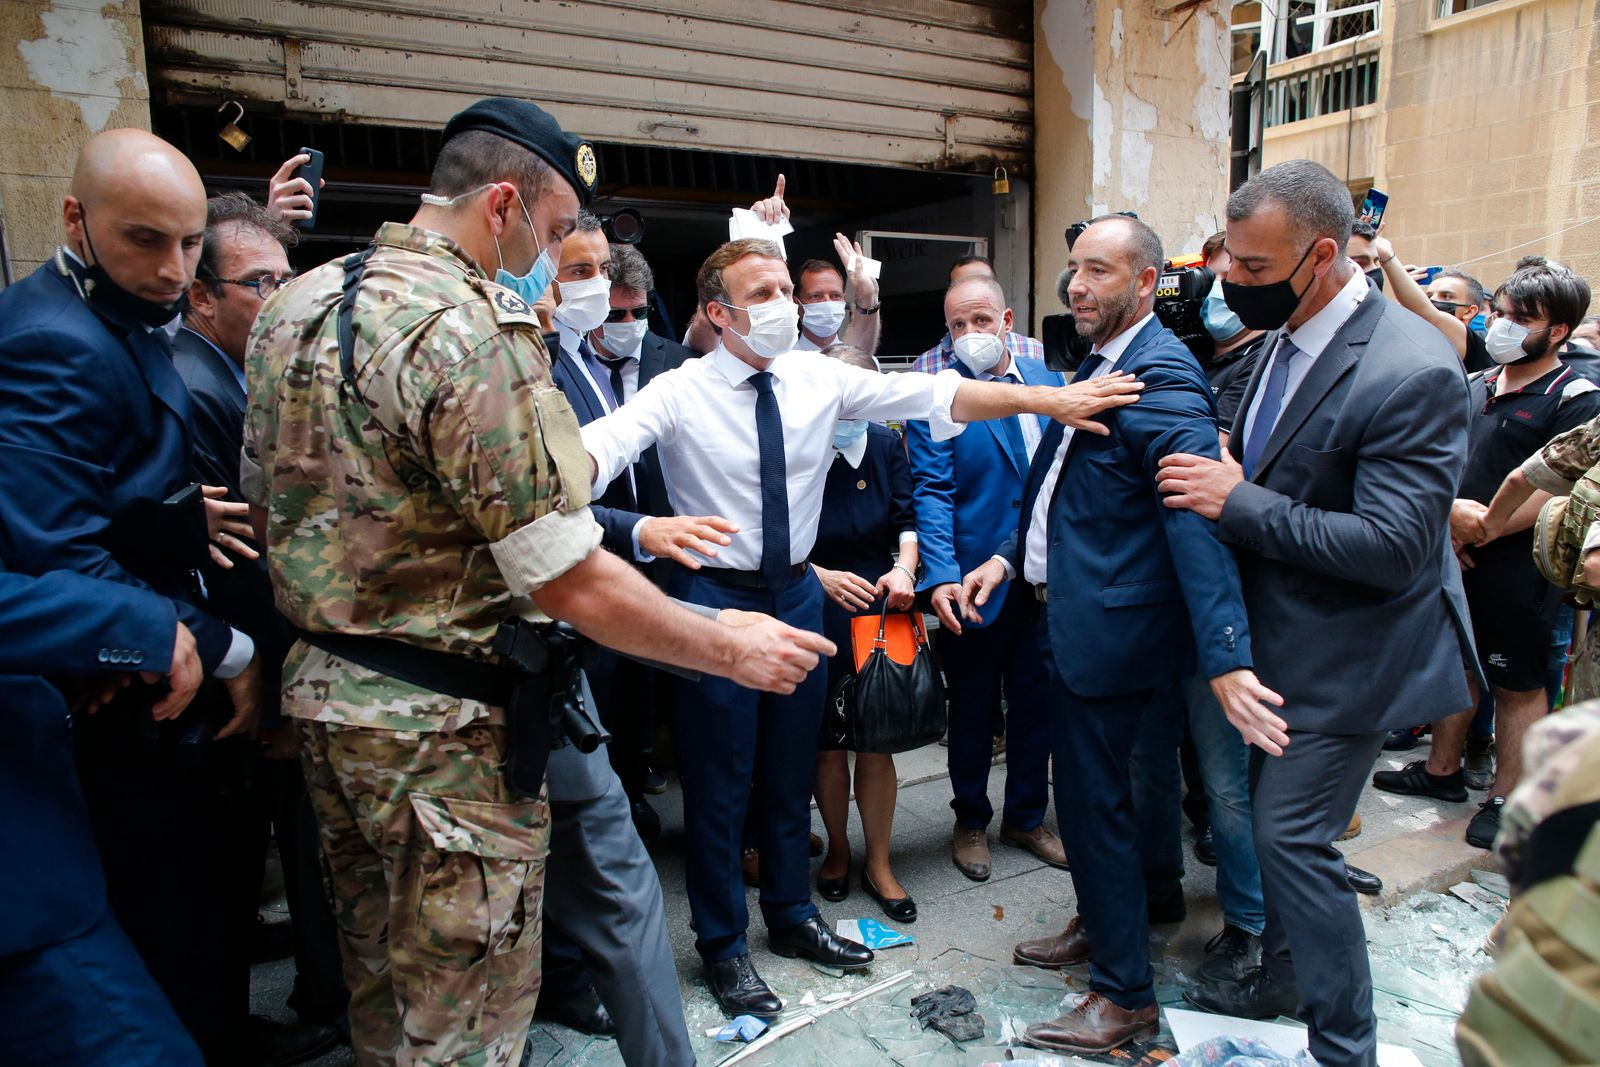 President Macron Visits Gemmayze District After Explosion - Beirut